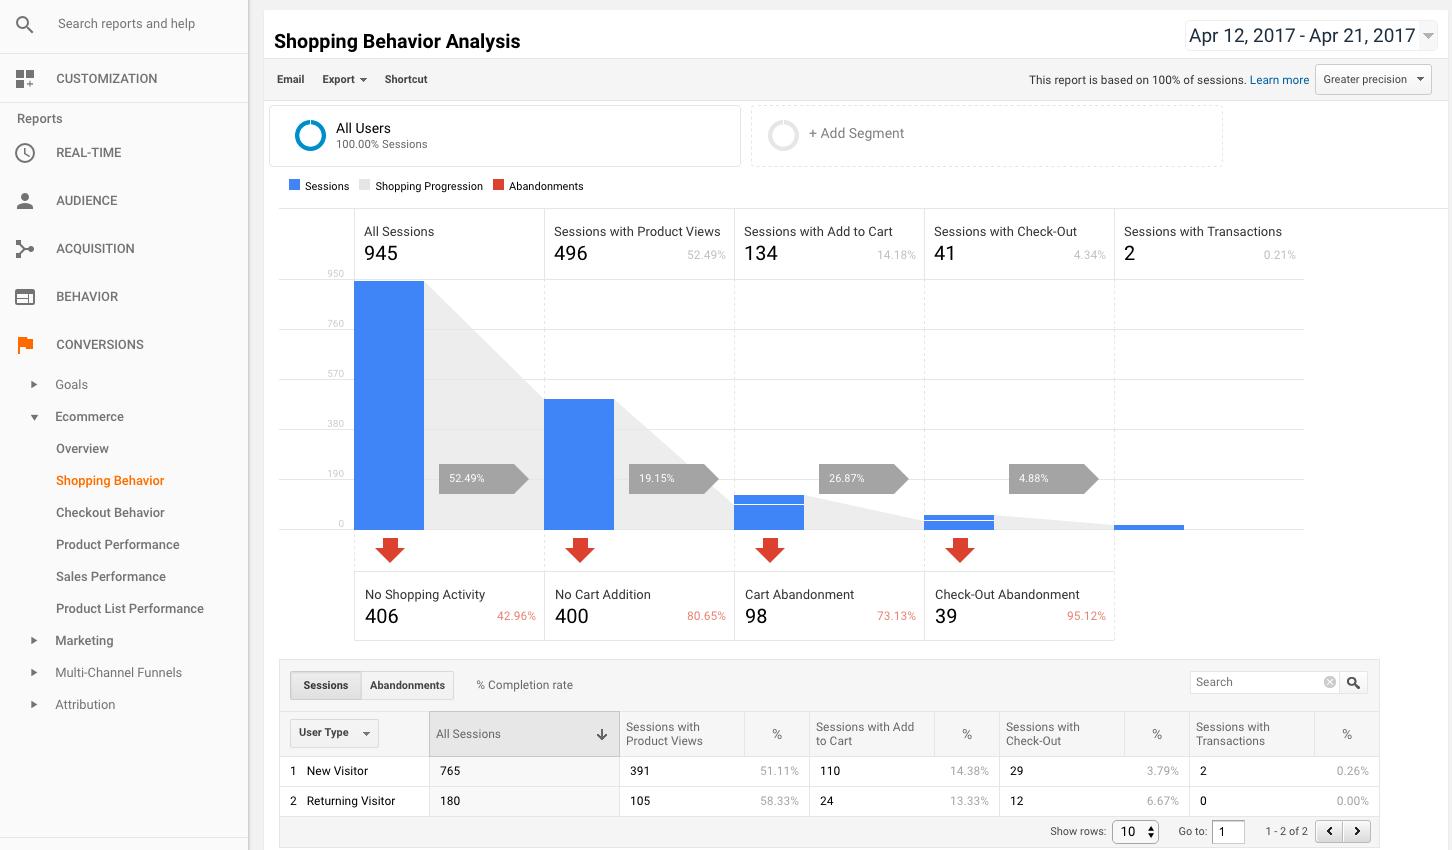 woocommerce-google-analytics-pro-shopping-behavior-analysis